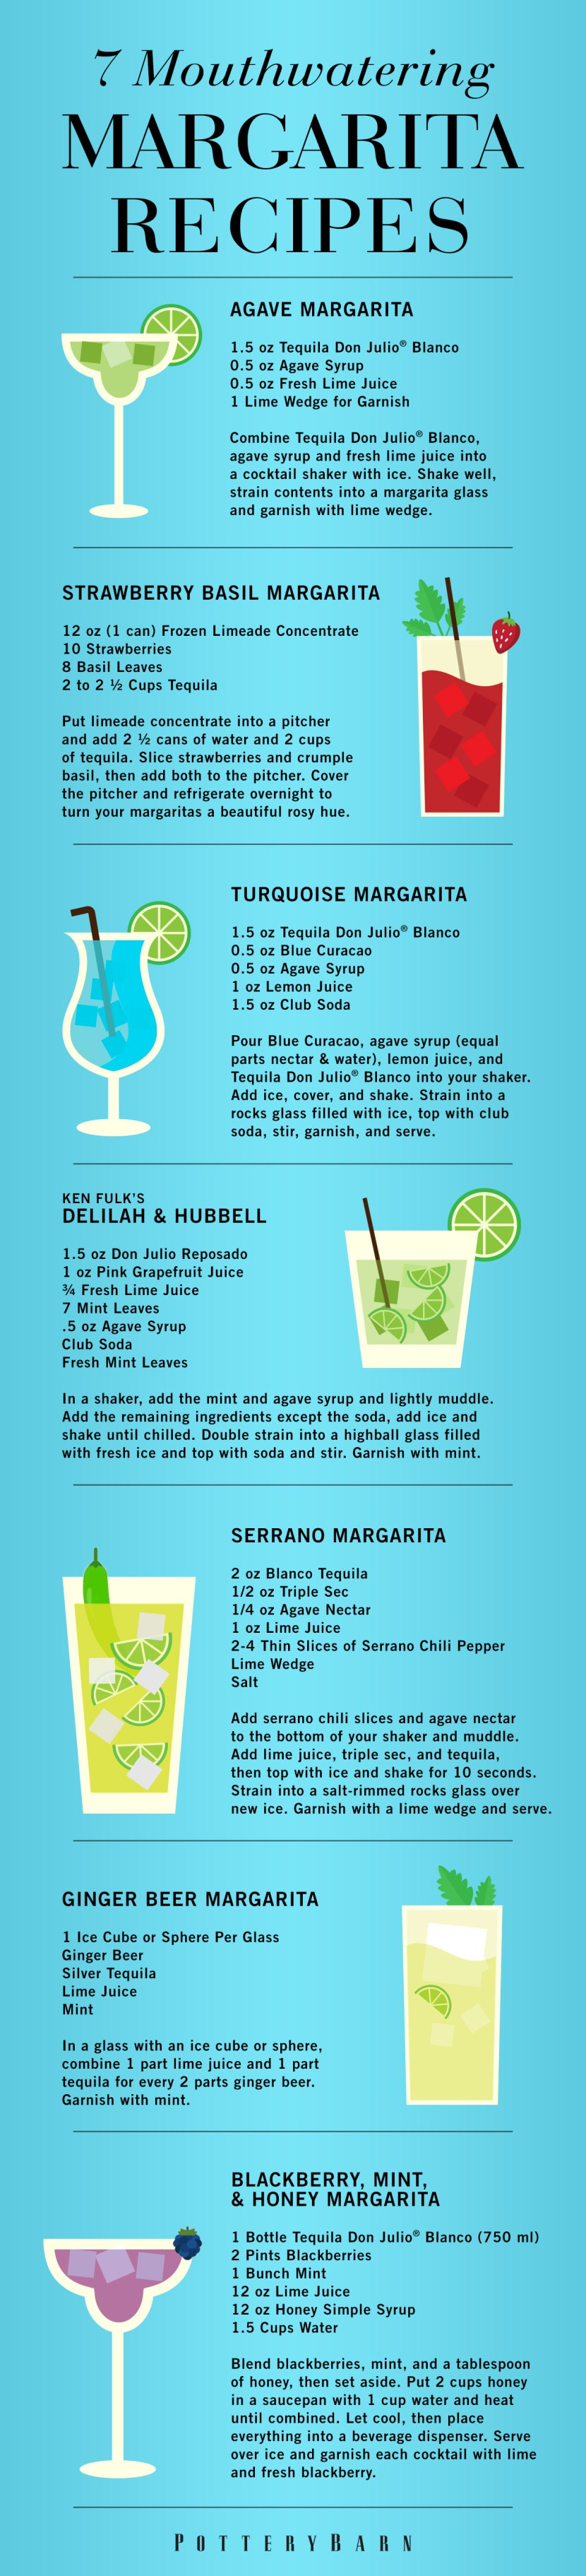 7 Mouthwatering Margarita Recipes